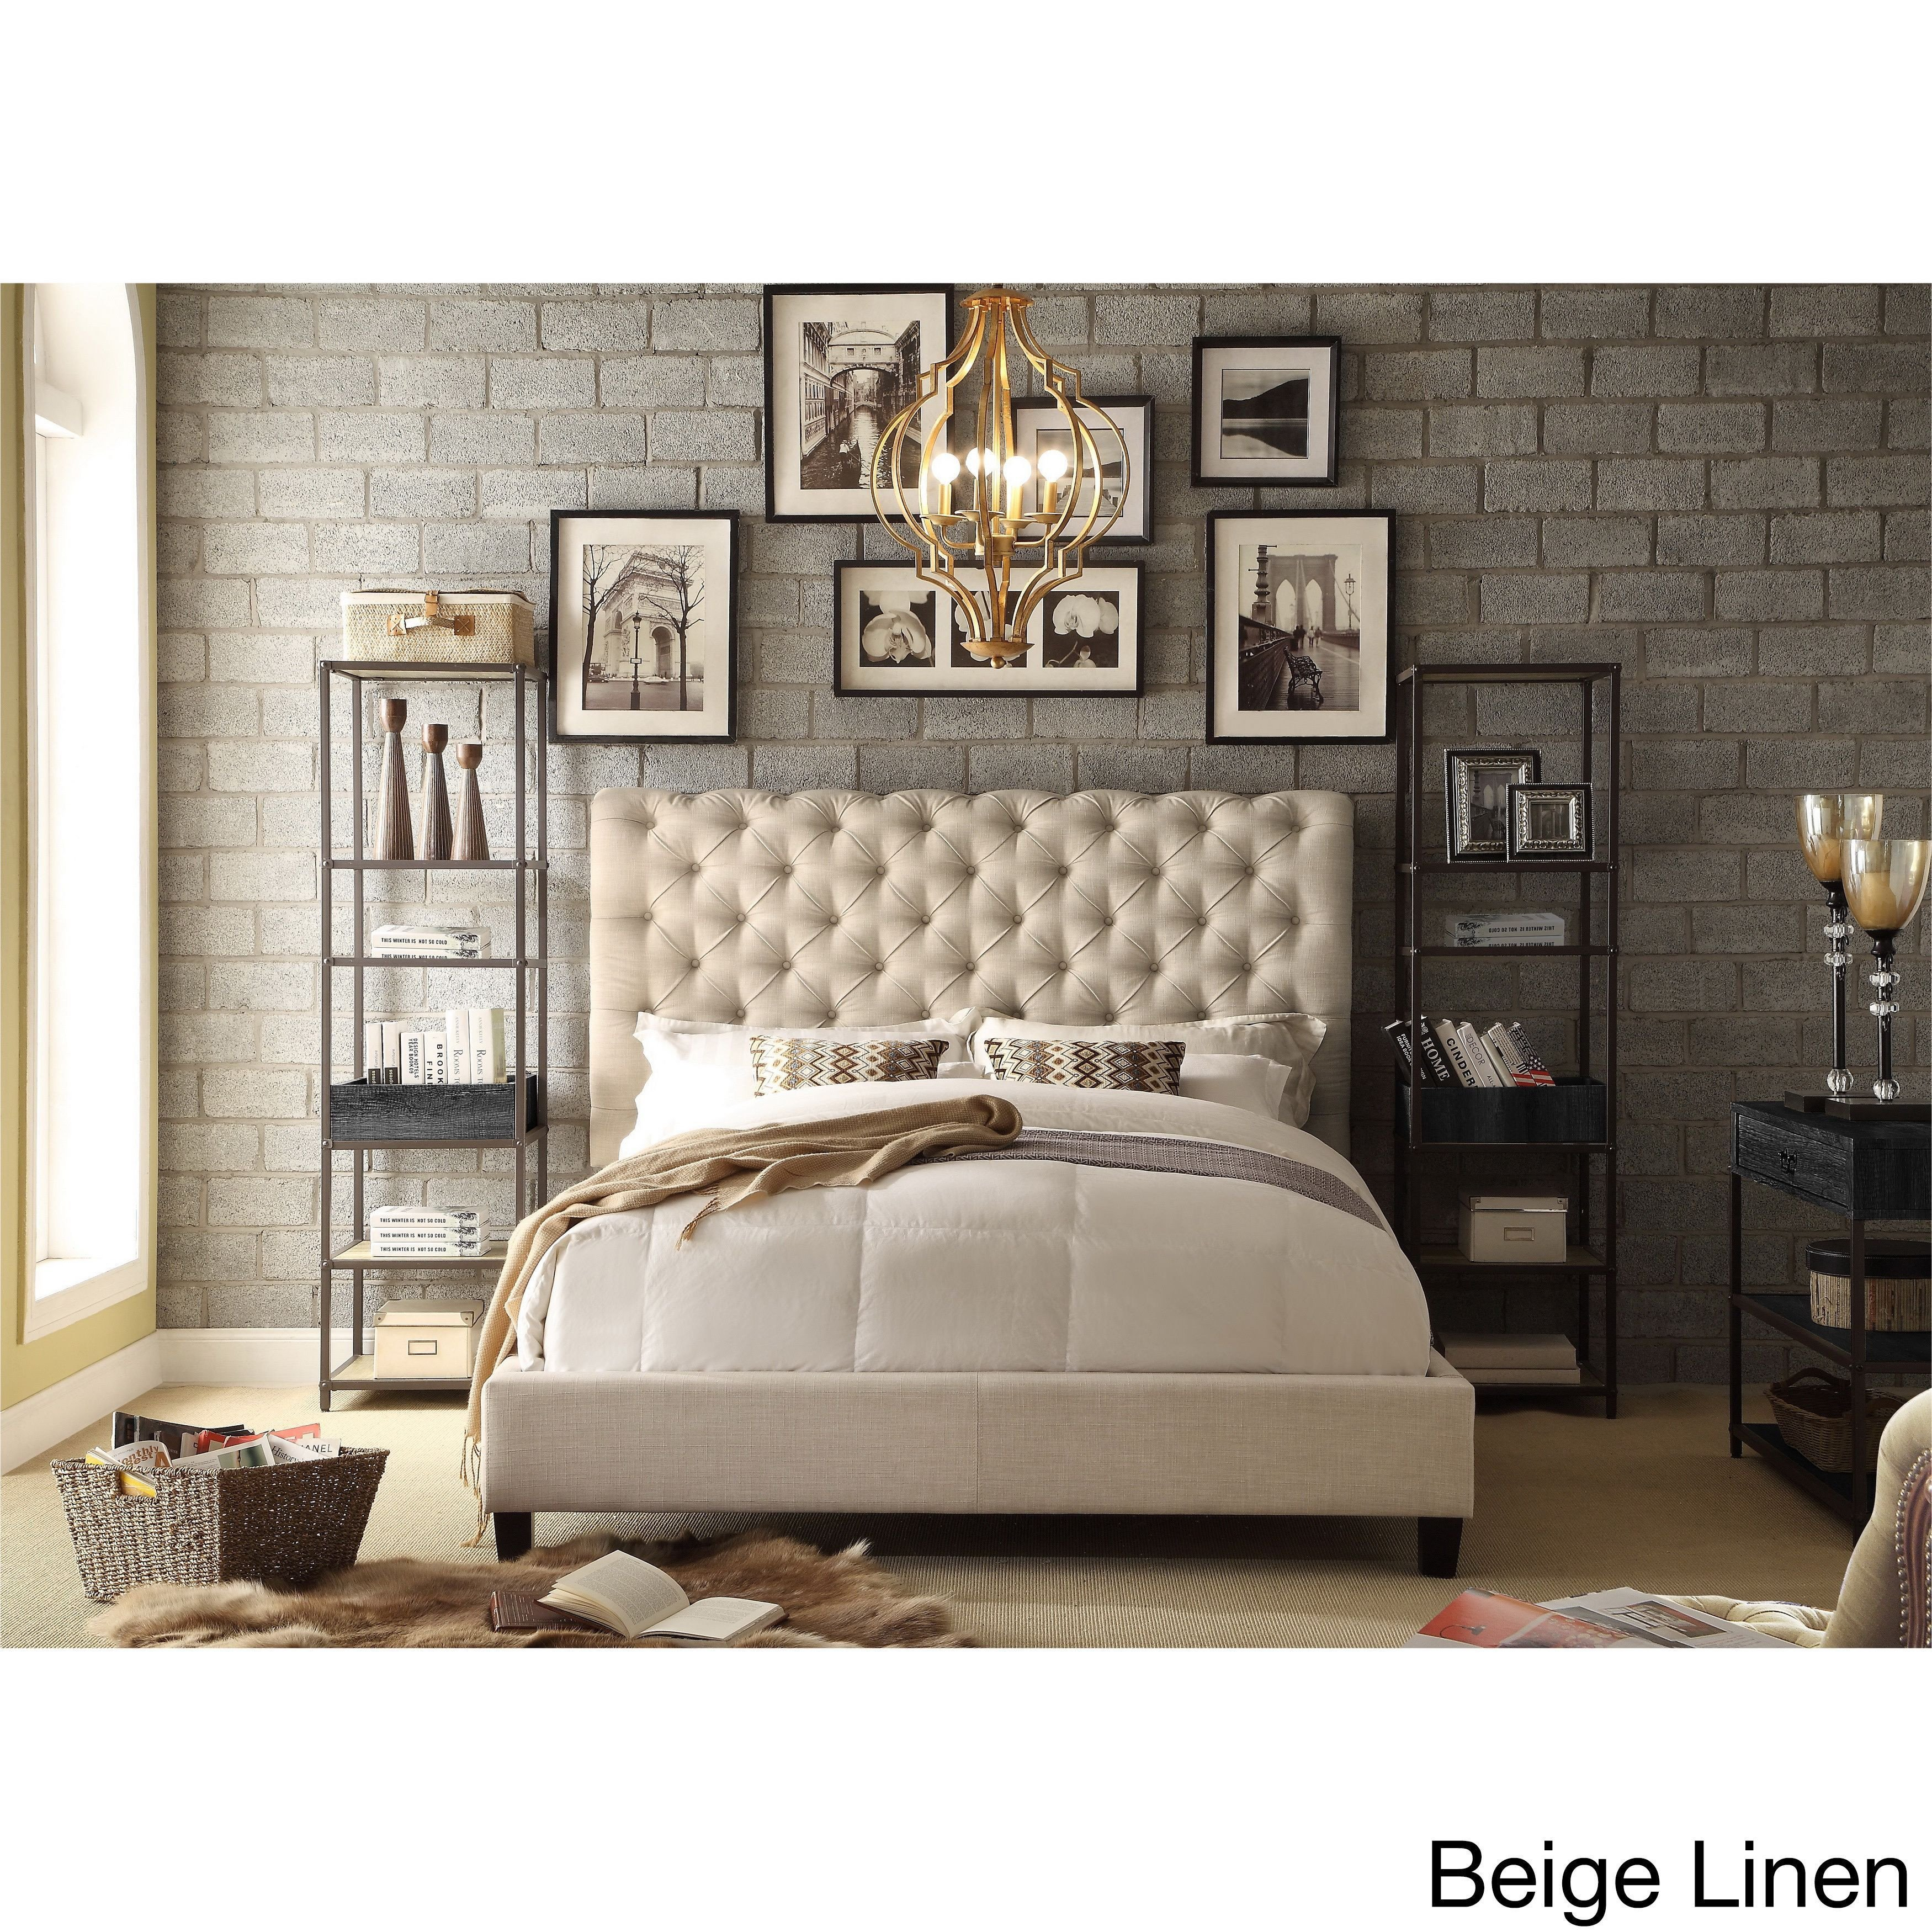 Cheap Bedroom Decor Online Shopping Lovely Moser Bay Furniture Calia Tufted Upholstered Platform Bed